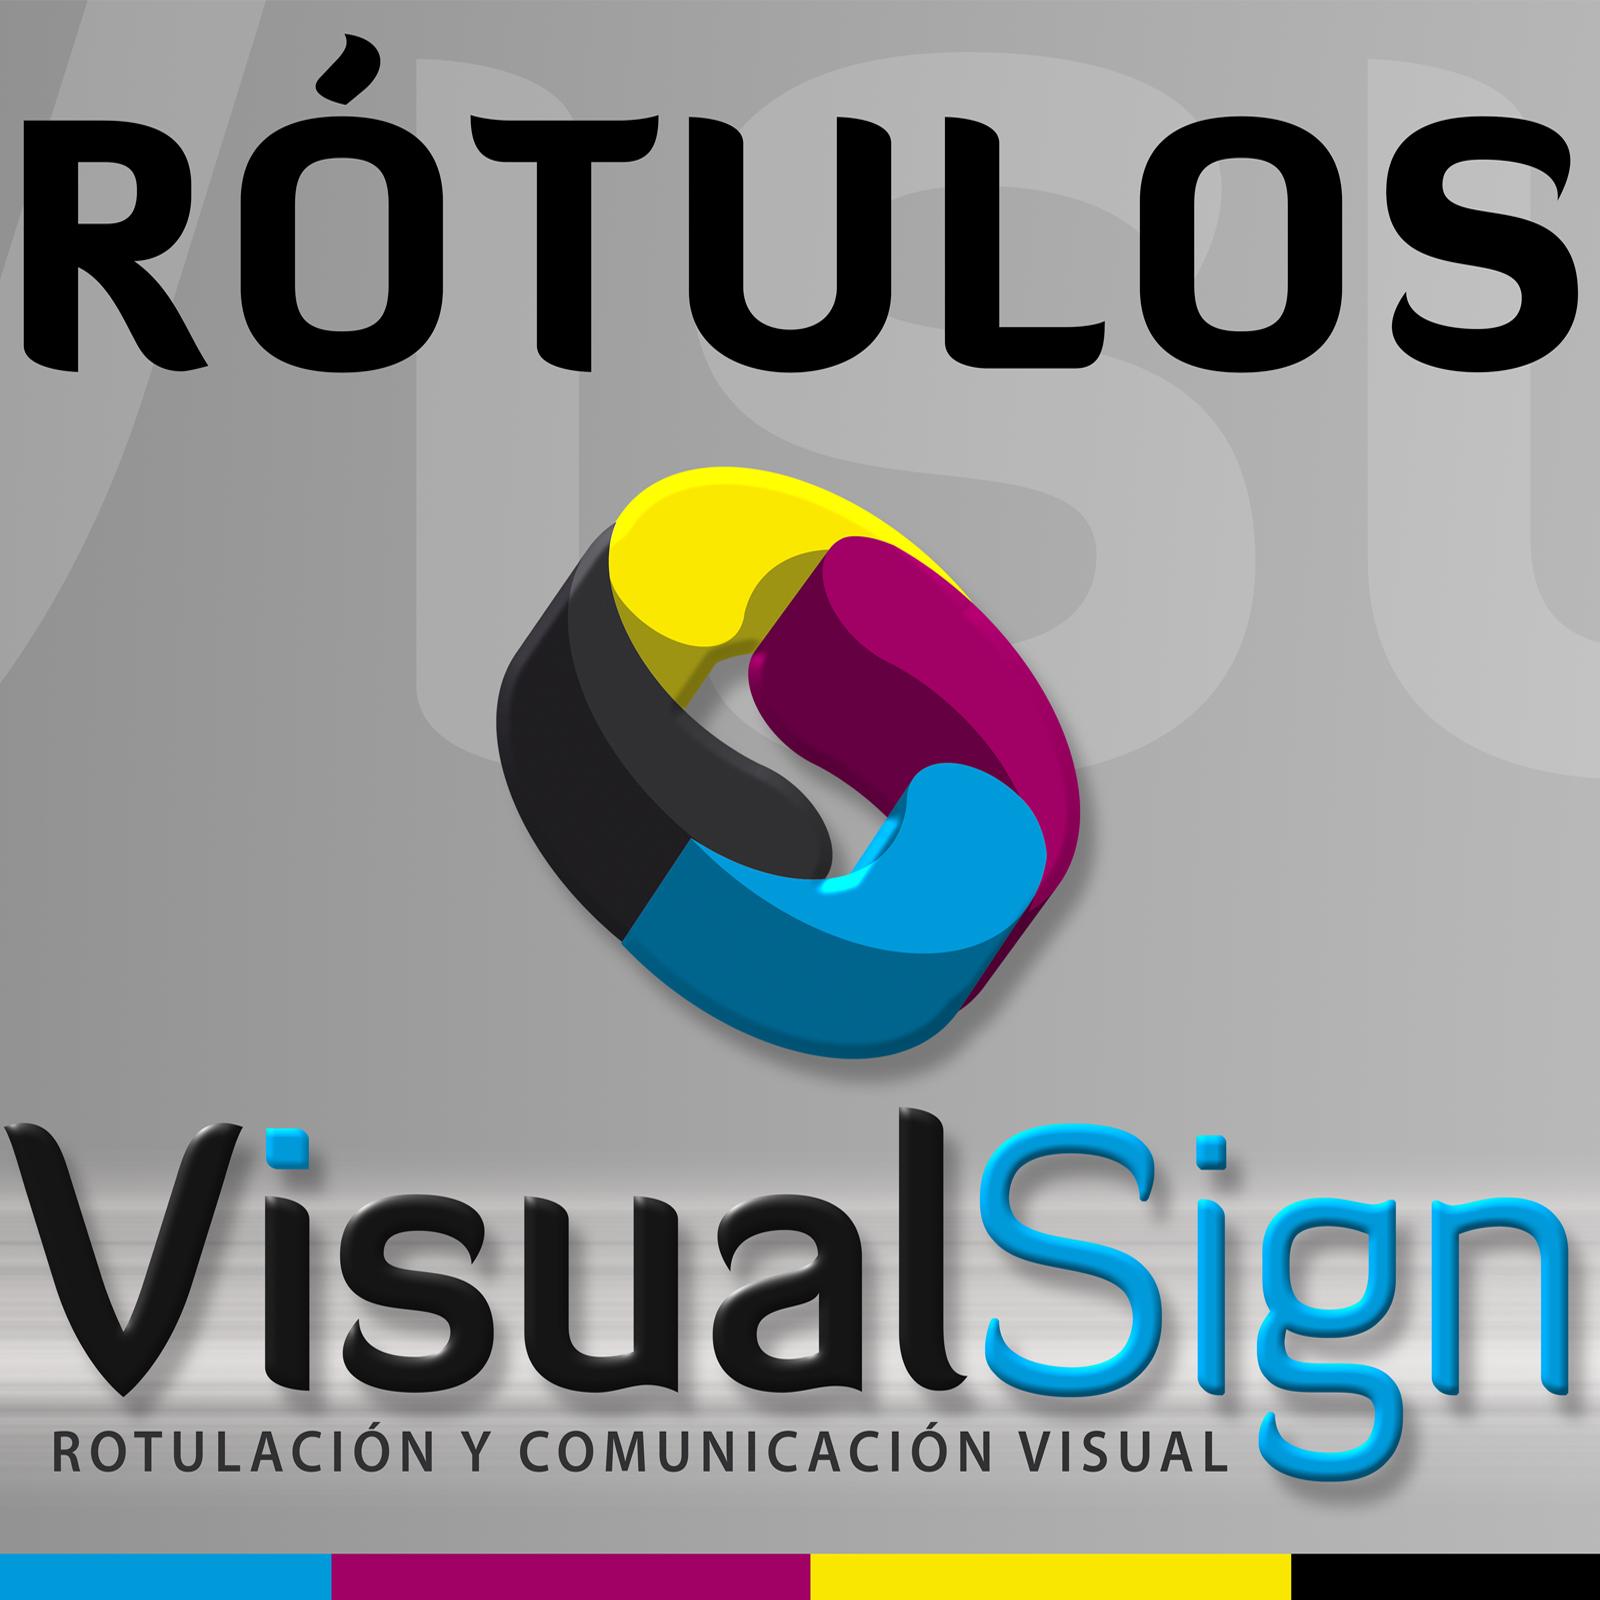 Visualsign